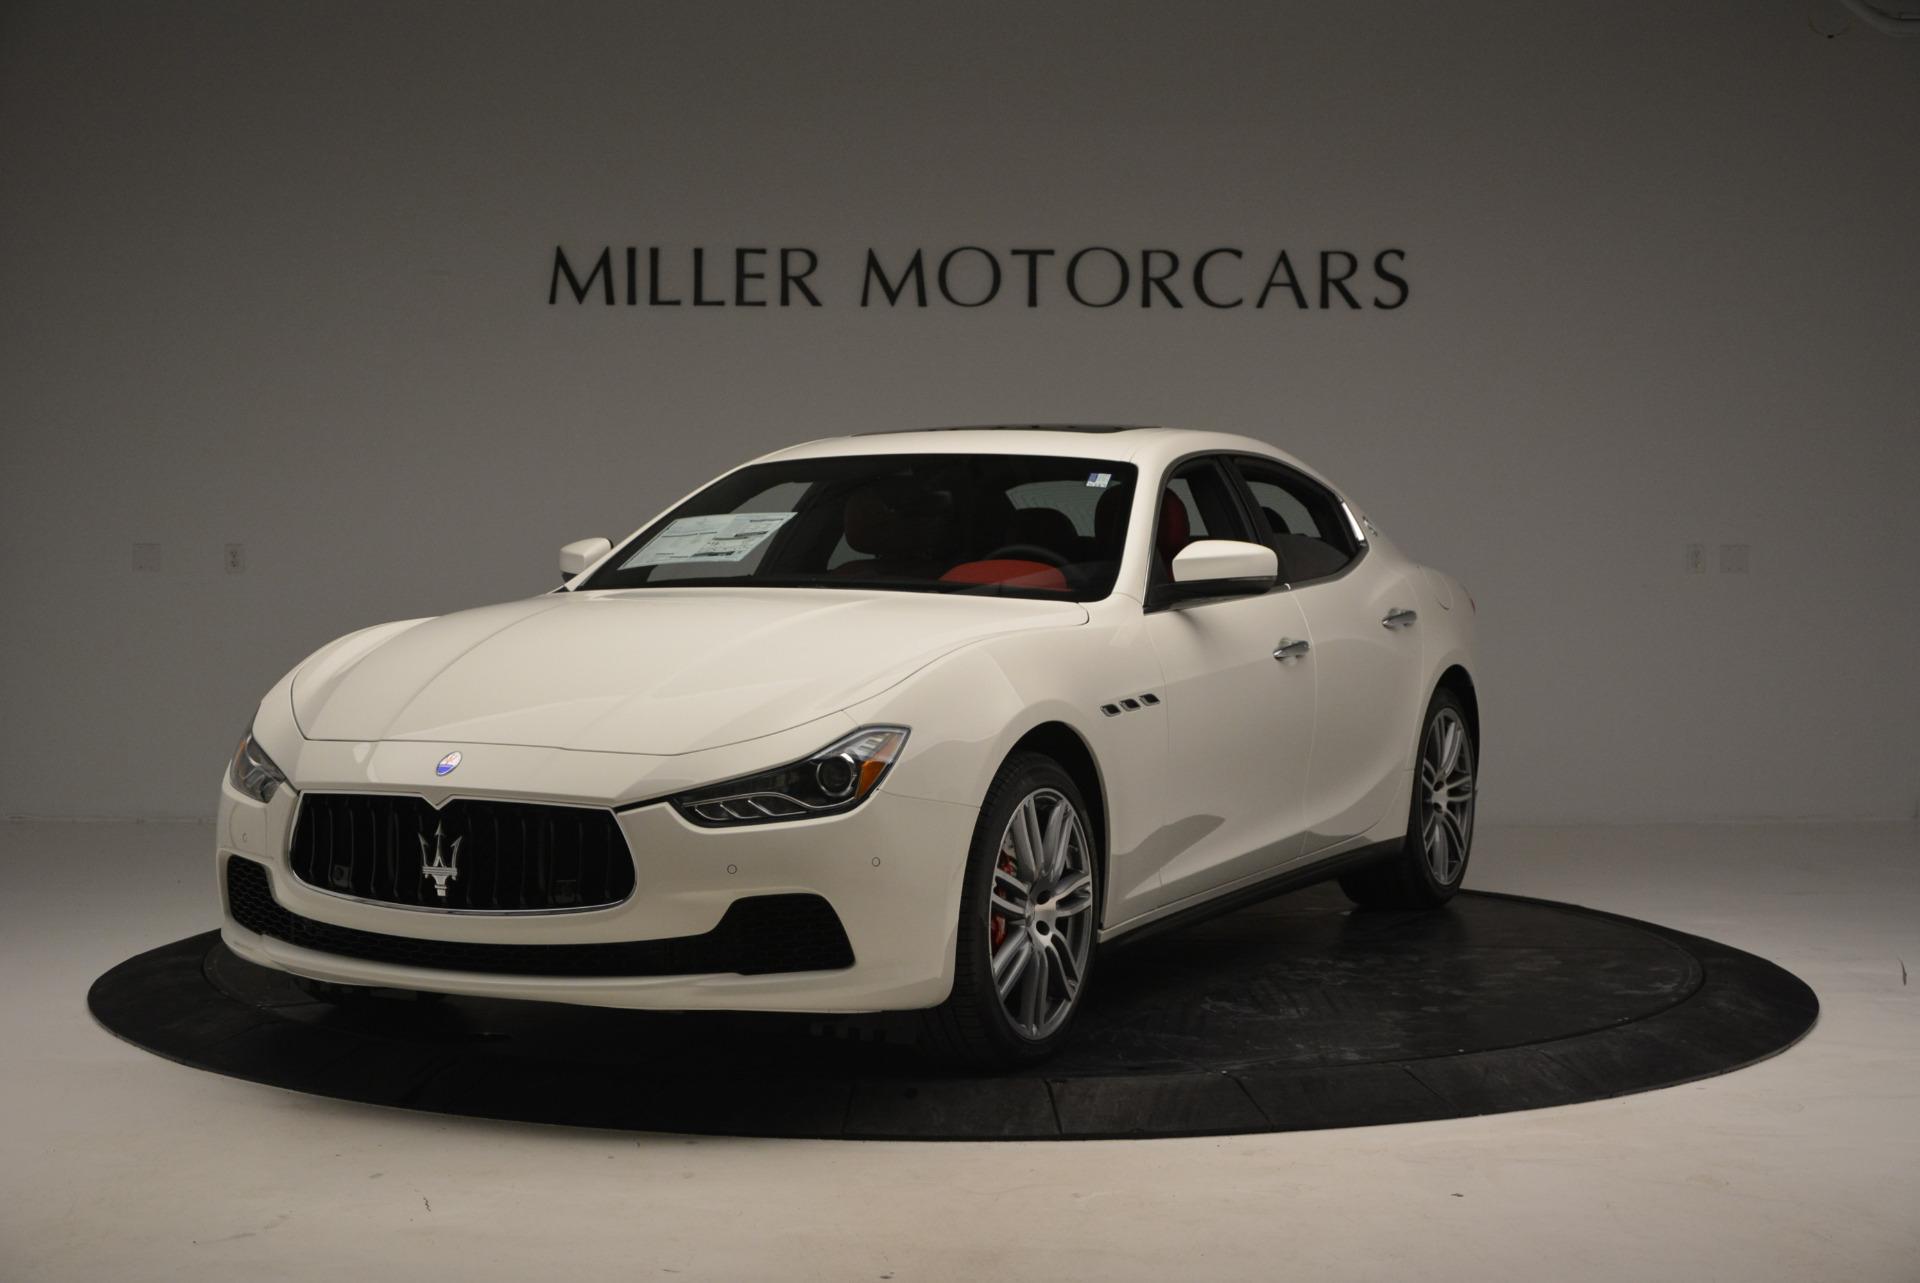 New 2017 Maserati Ghibli S Q4 For Sale In Greenwich, CT 792_main